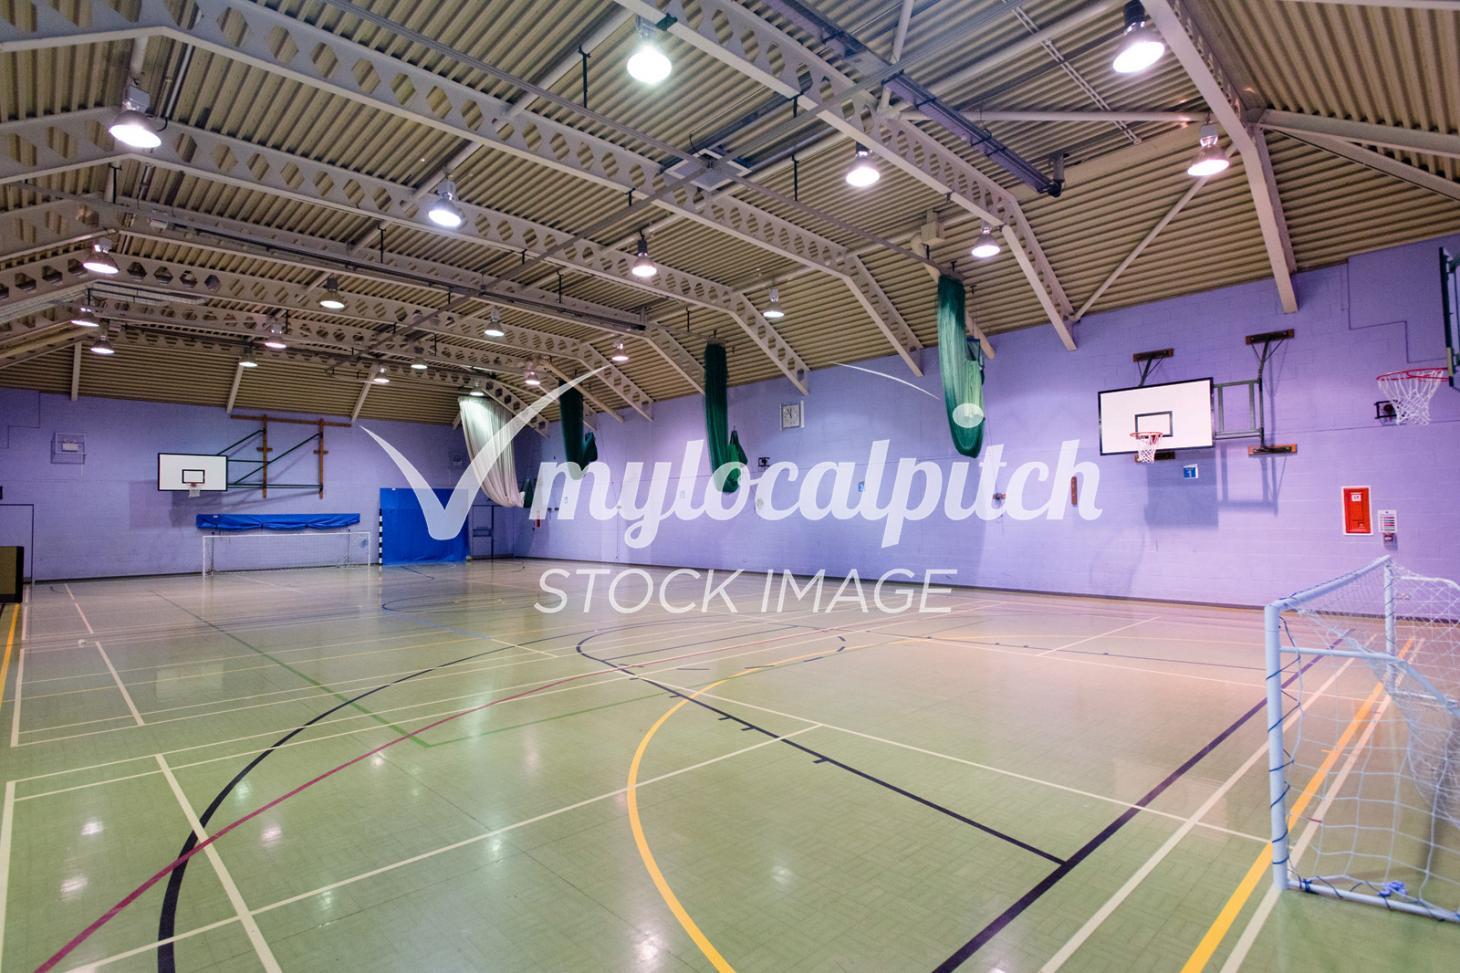 Deptford Green Community Leisure Indoor netball court